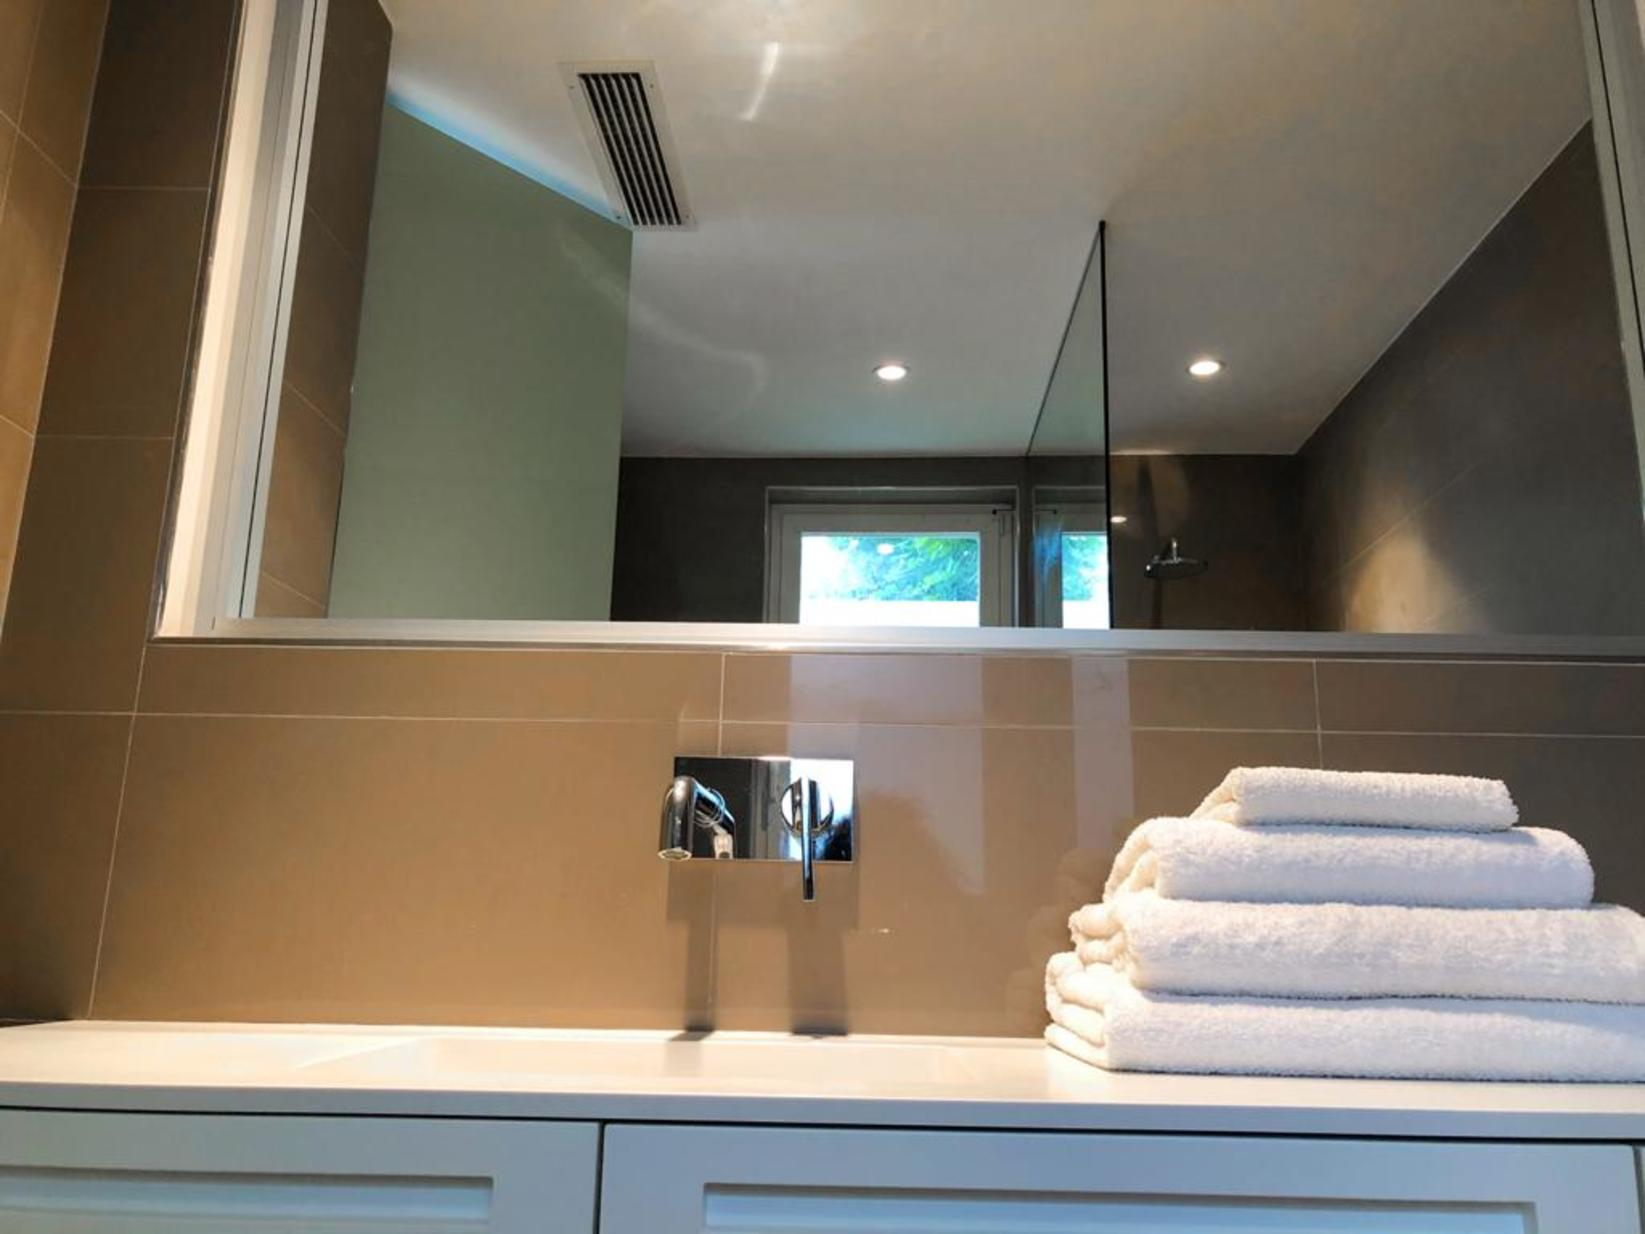 3 bed Villa For Rent in Bahar ic-Caghaq, Bahar ic-Caghaq - thumb 24